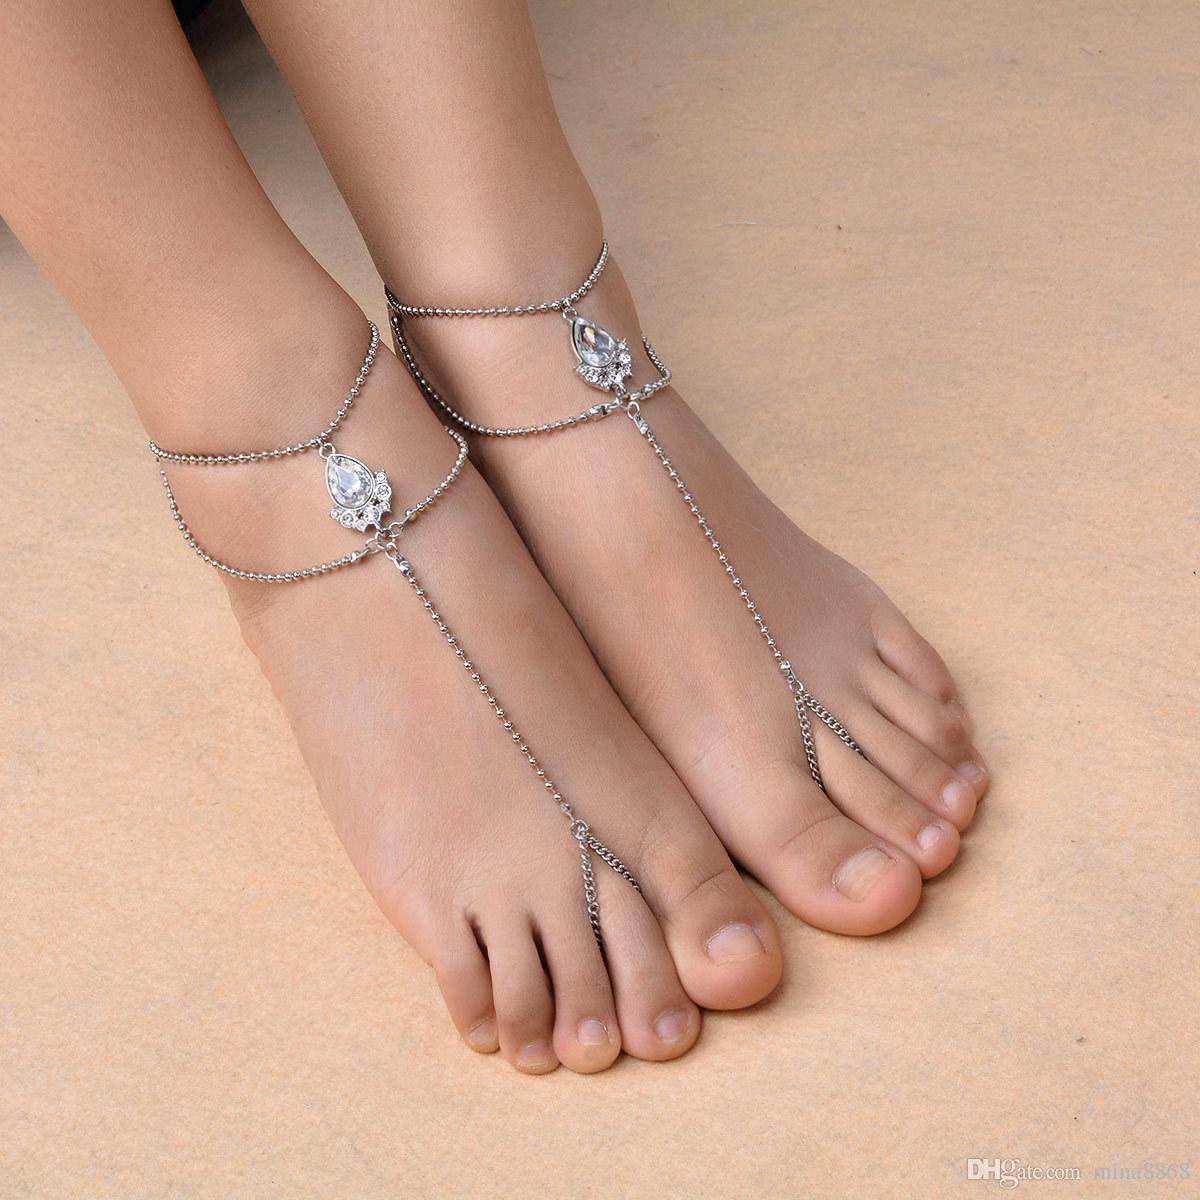 Crystal*Anklets Chain Bracelet Women Barefoot Sandal Toe Ring Beach Foot Jewelry